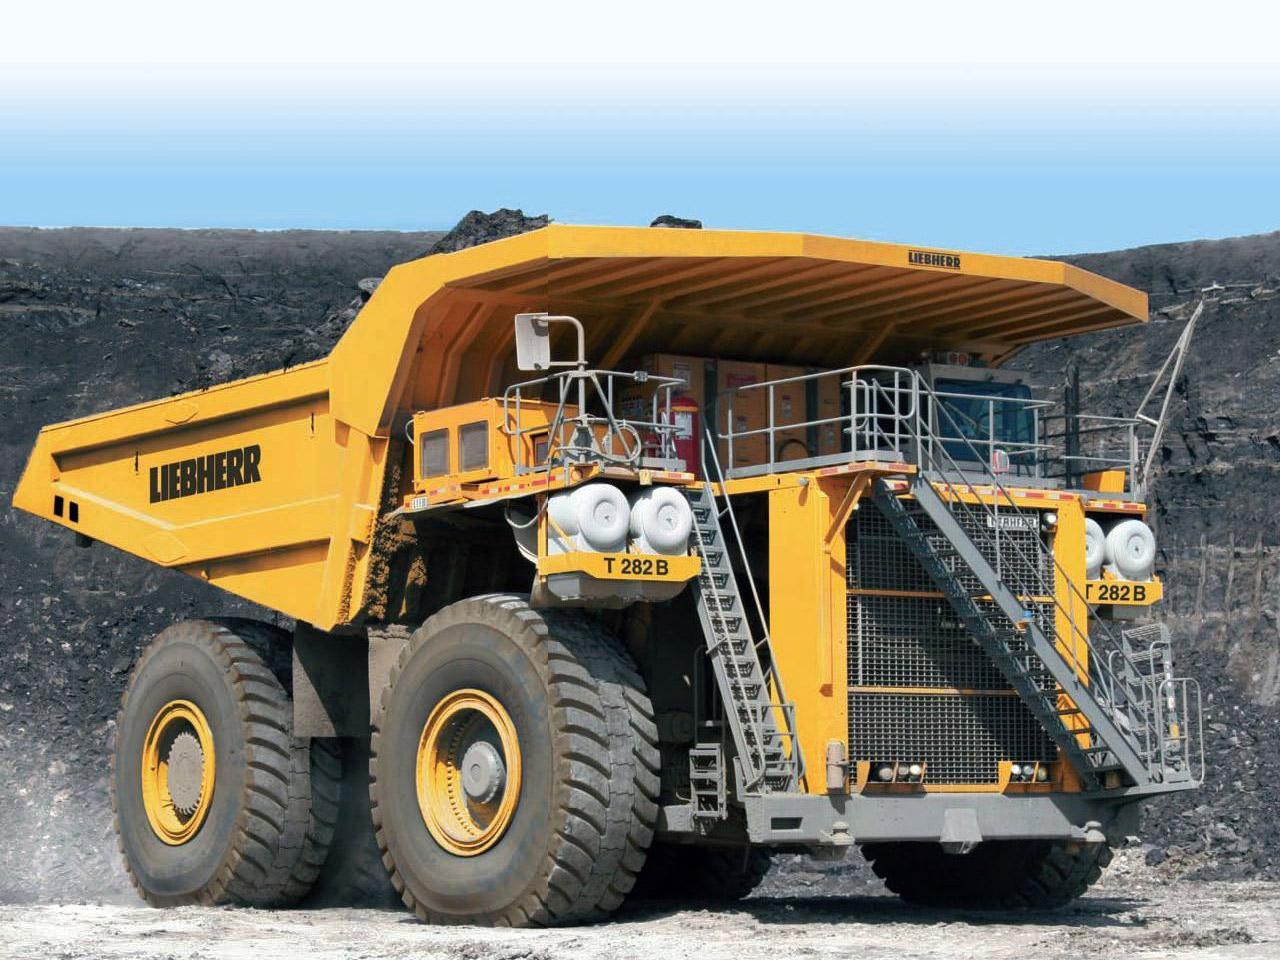 LIEBHERR T 282B : أكبر ماكنة شاحنة- على وجه الأرض